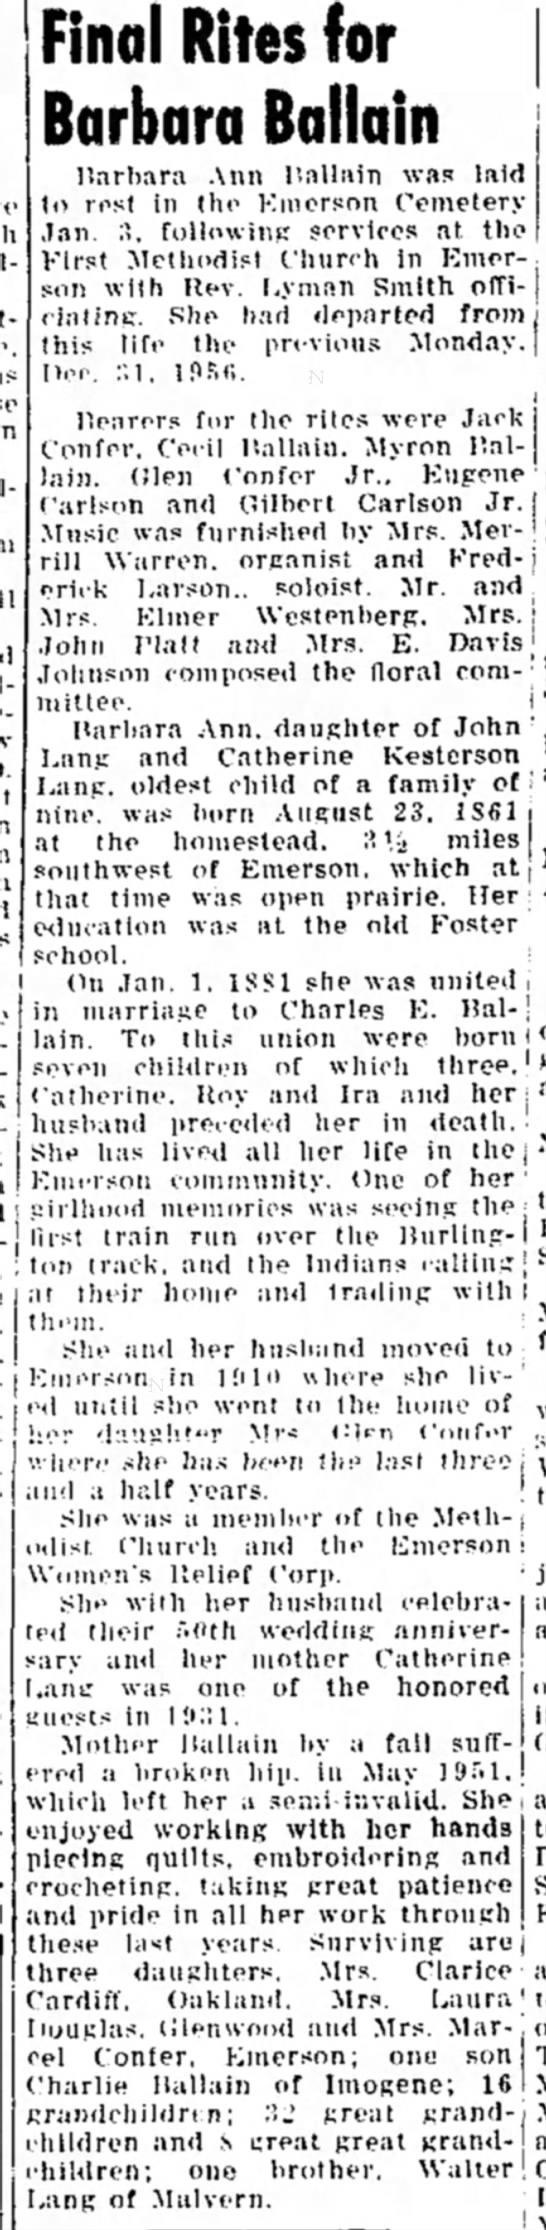 Malvern Leader 10 Jan 1957 Barbara A. Lang, daugh of Catherine Kesterson -